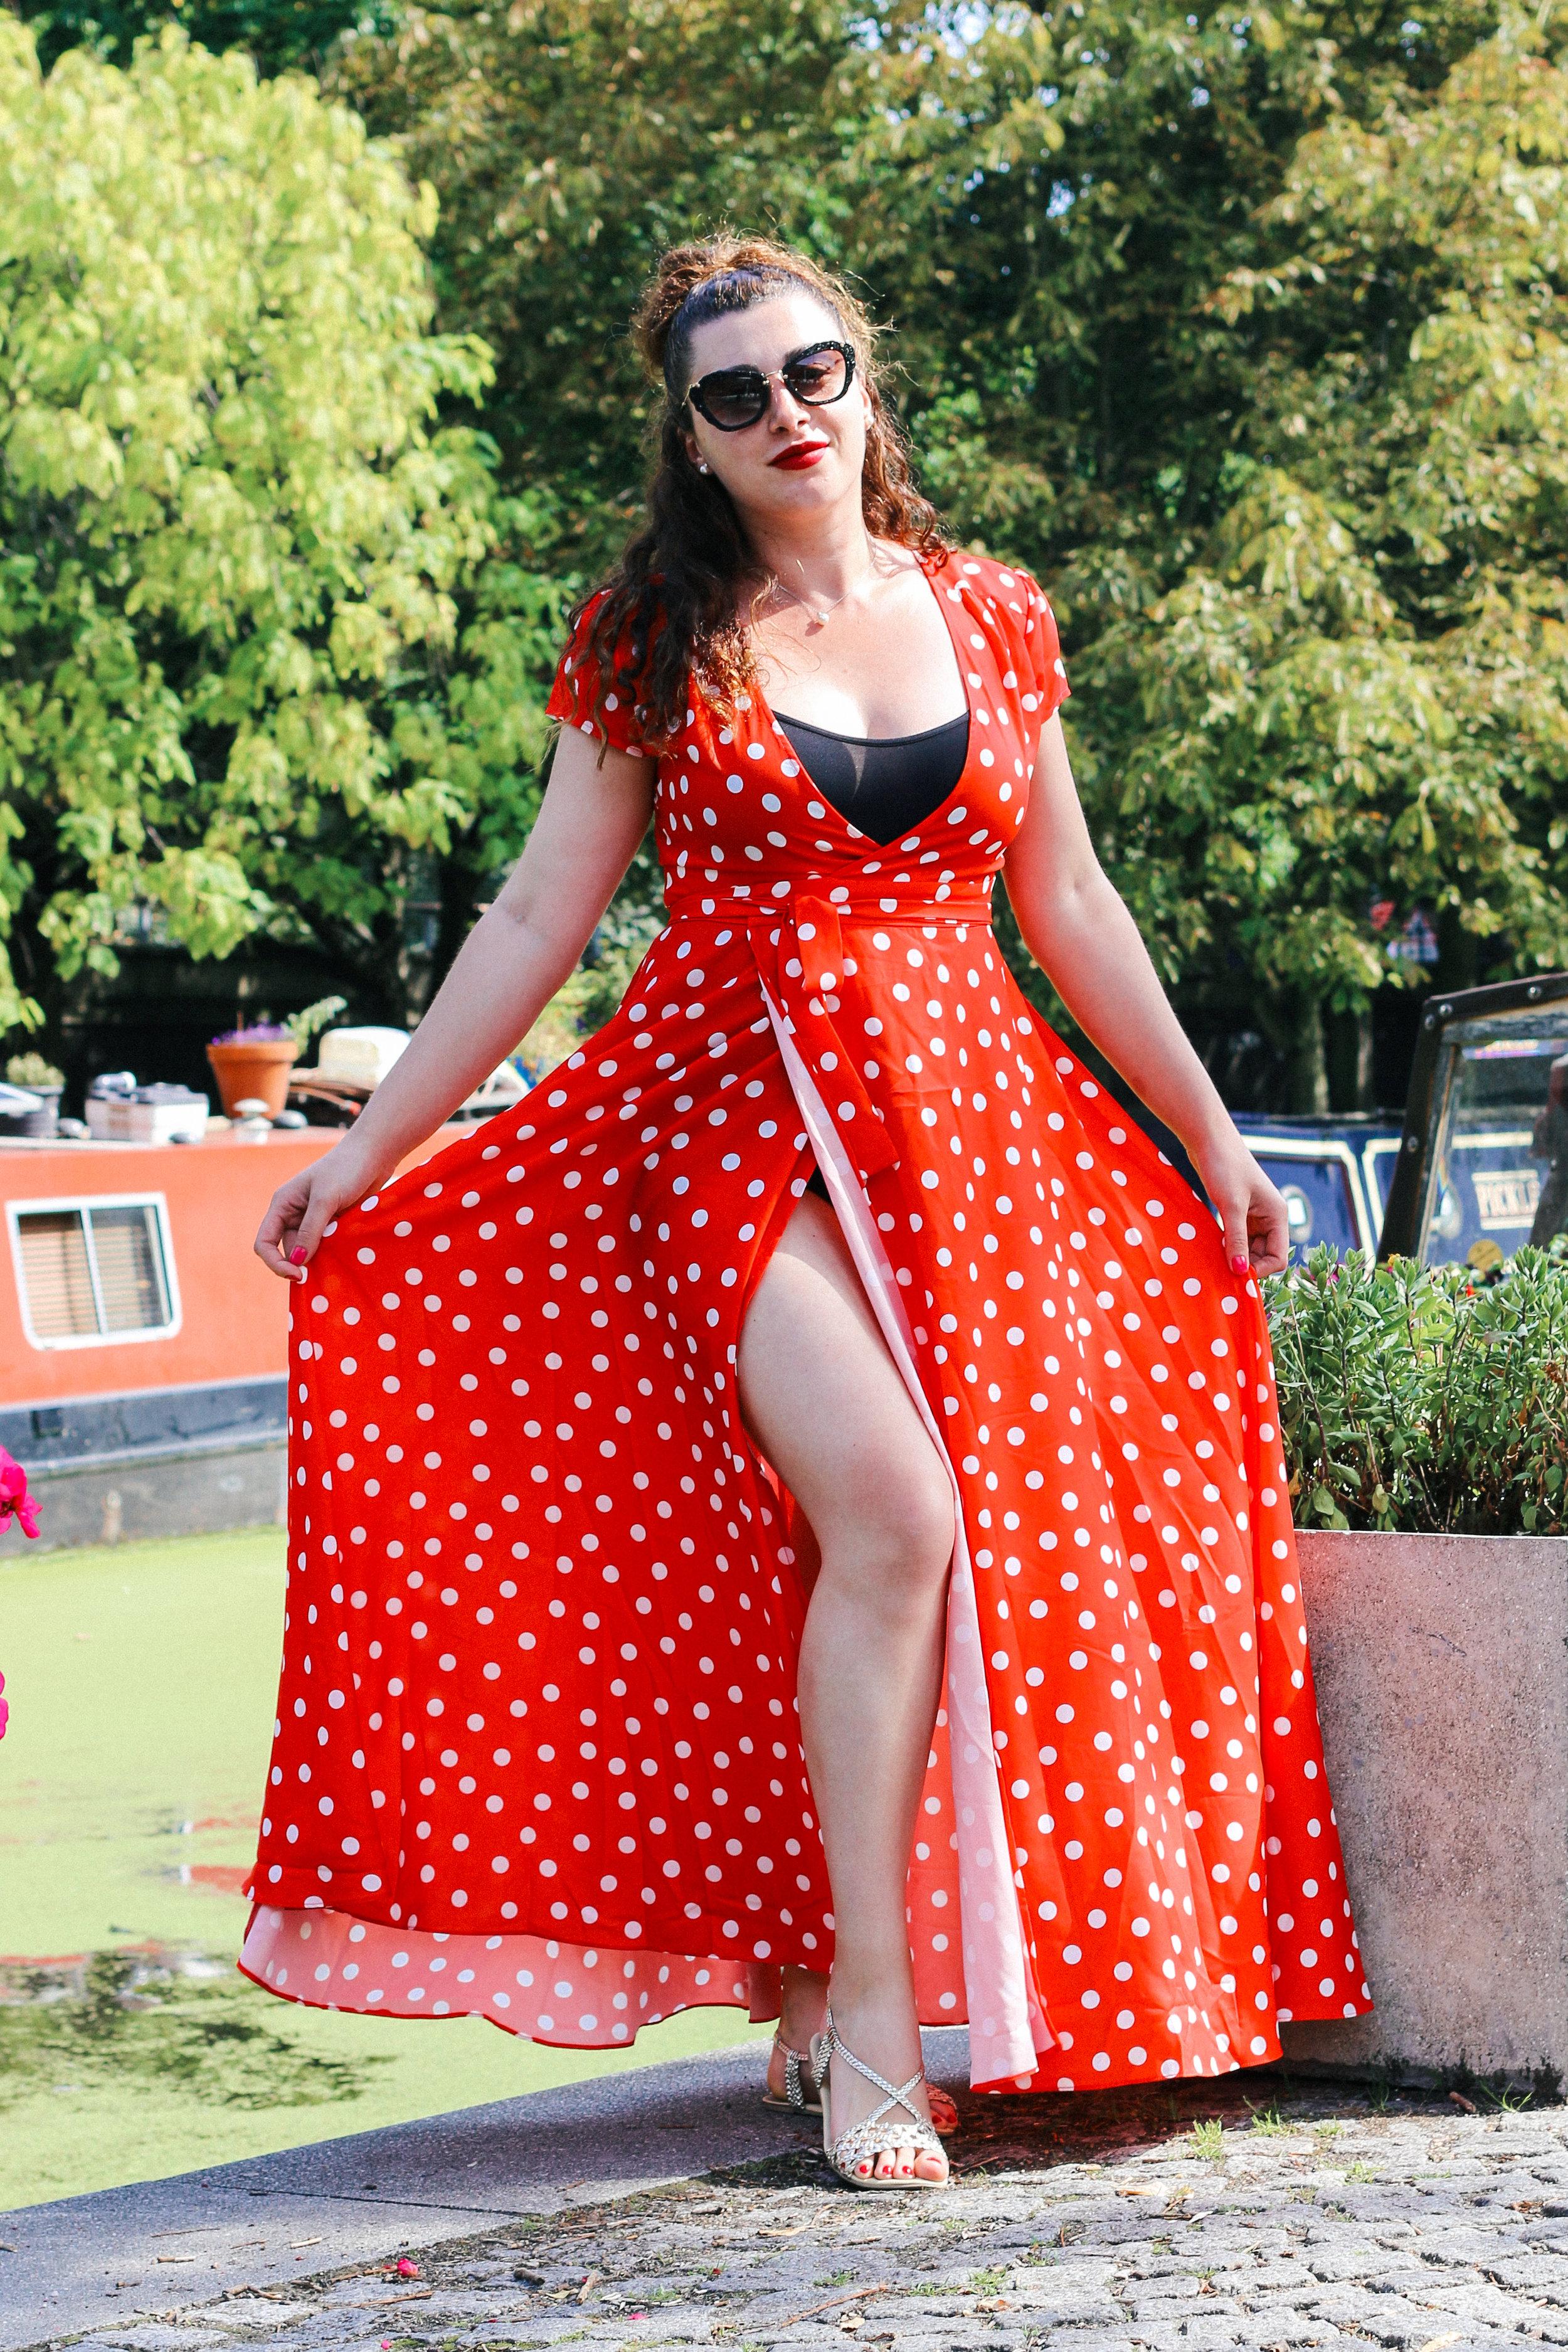 Sally-red dress.jpg